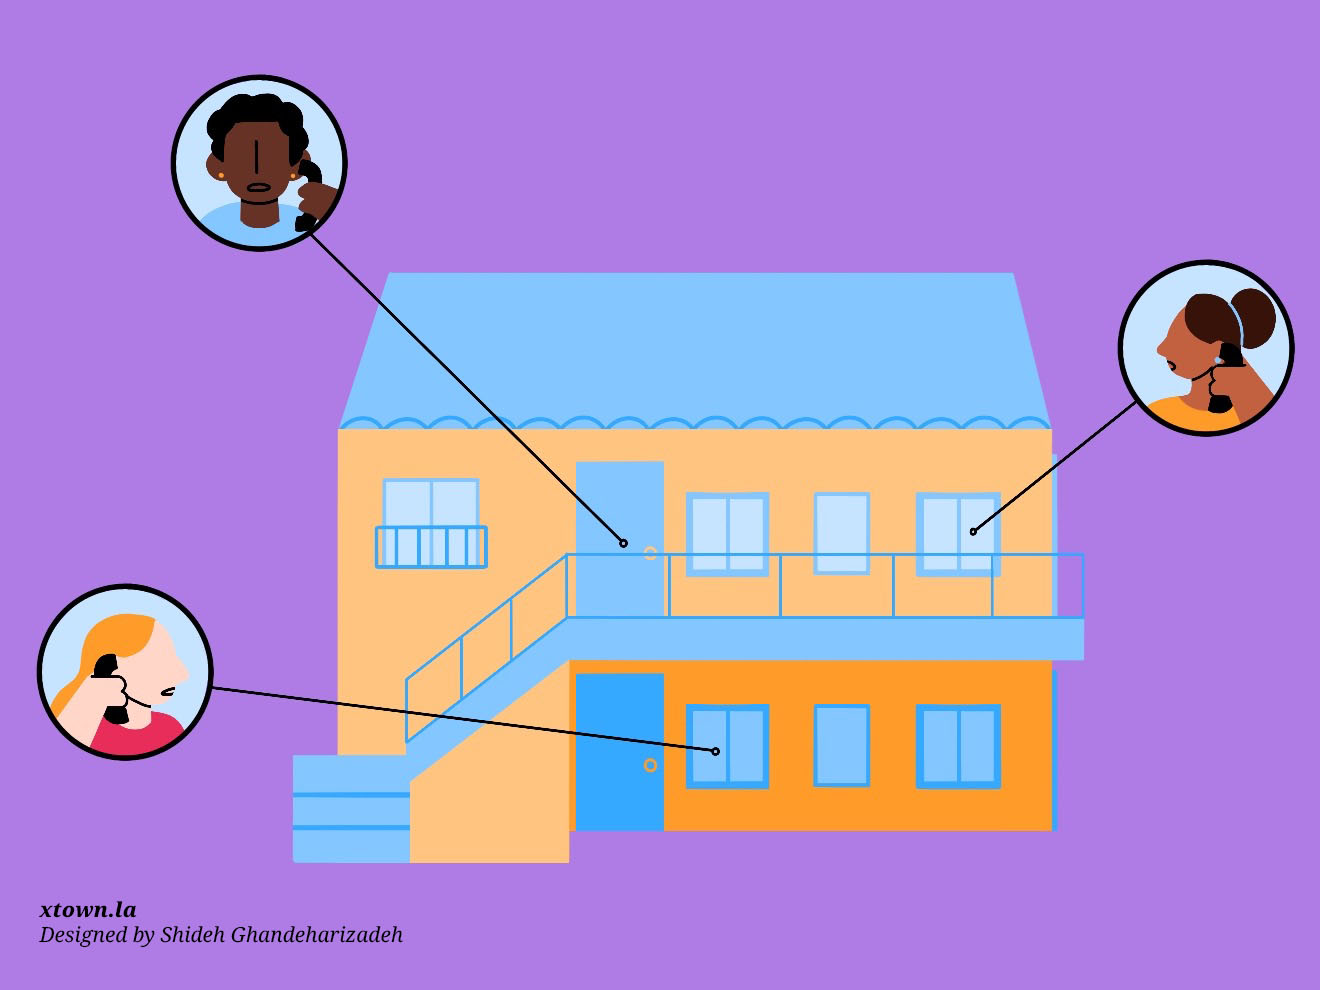 Illustration depicting landlord-tenant disputes during COVID-19